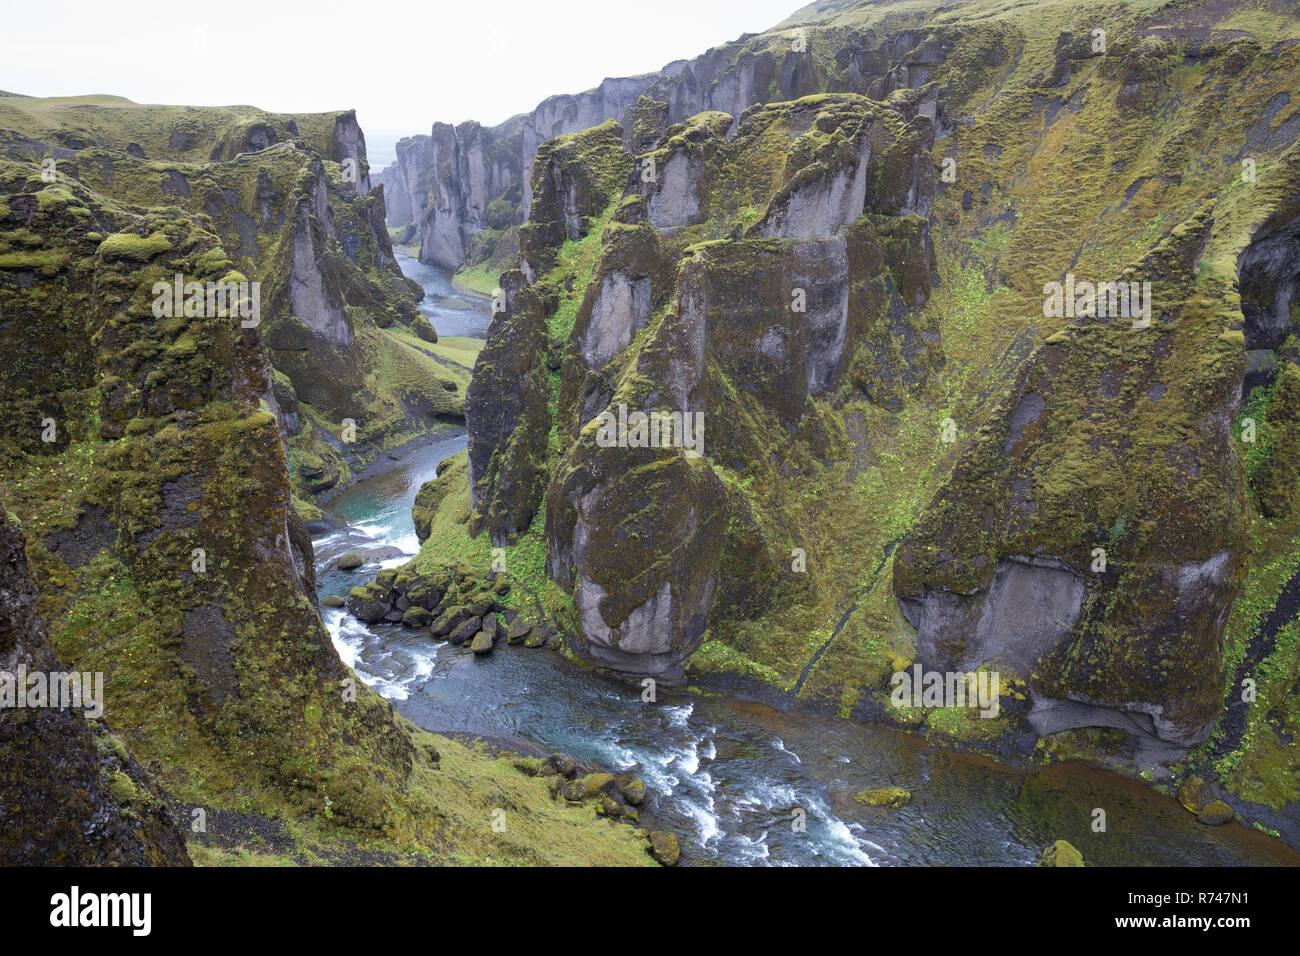 - Schlucht Fjaðrárgljúfur, Fjathrargljufur-Schlucht, Schlucht, Canyon im Süden von Island, durch die Schlucht fliesst der namensgebende Fluss Fjaðrá, können Stockbild